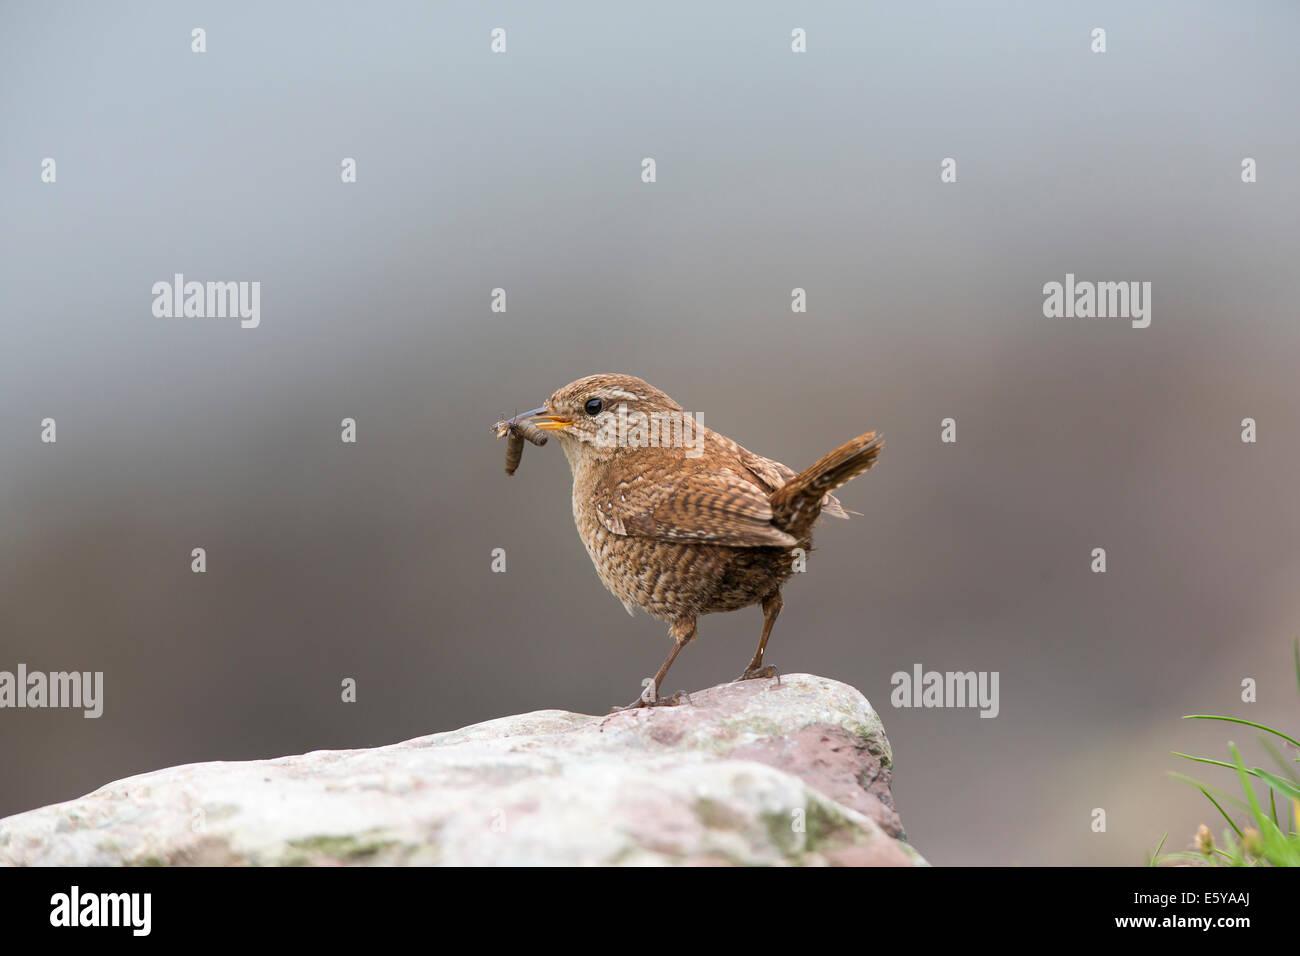 Shetland Wren, Troglodytes troglodytes zetlandicus feeding young - Stock Image